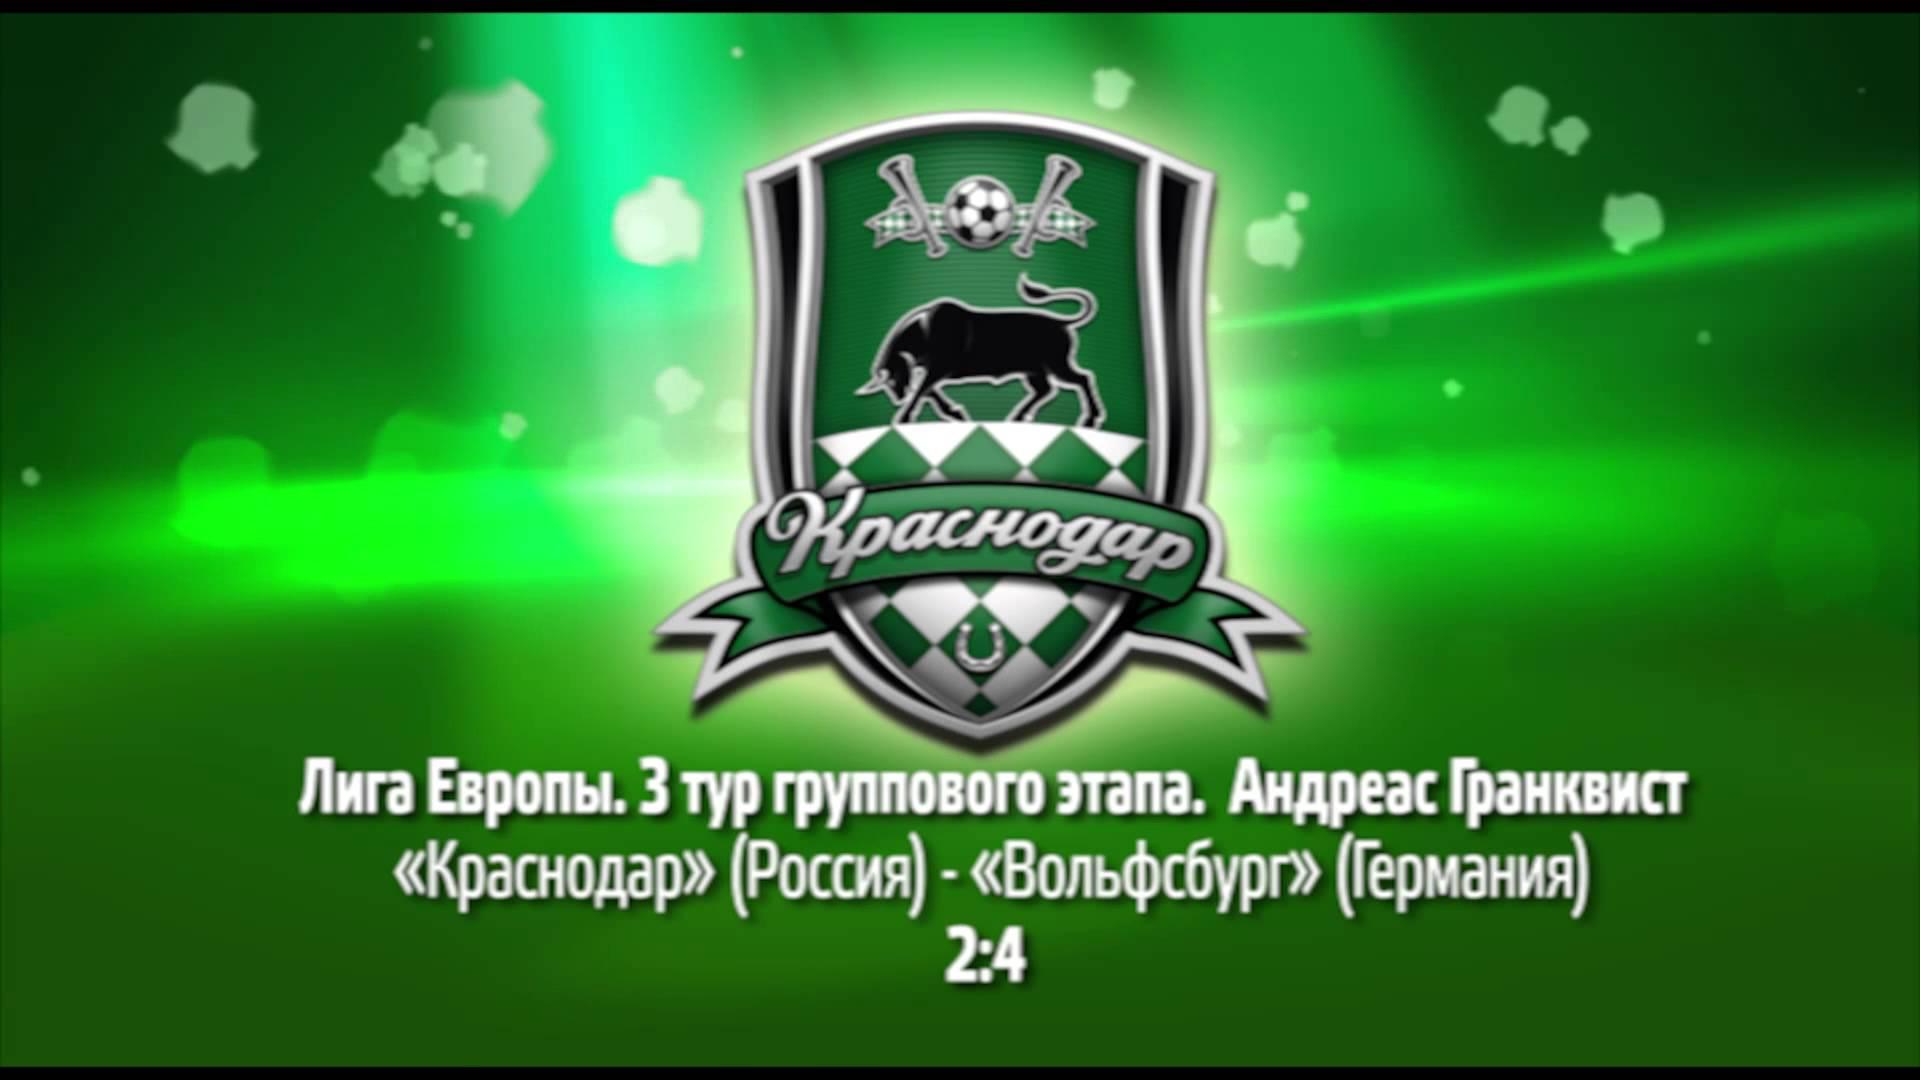 Голы забитые ФК «Краснодар» в октябре-2014